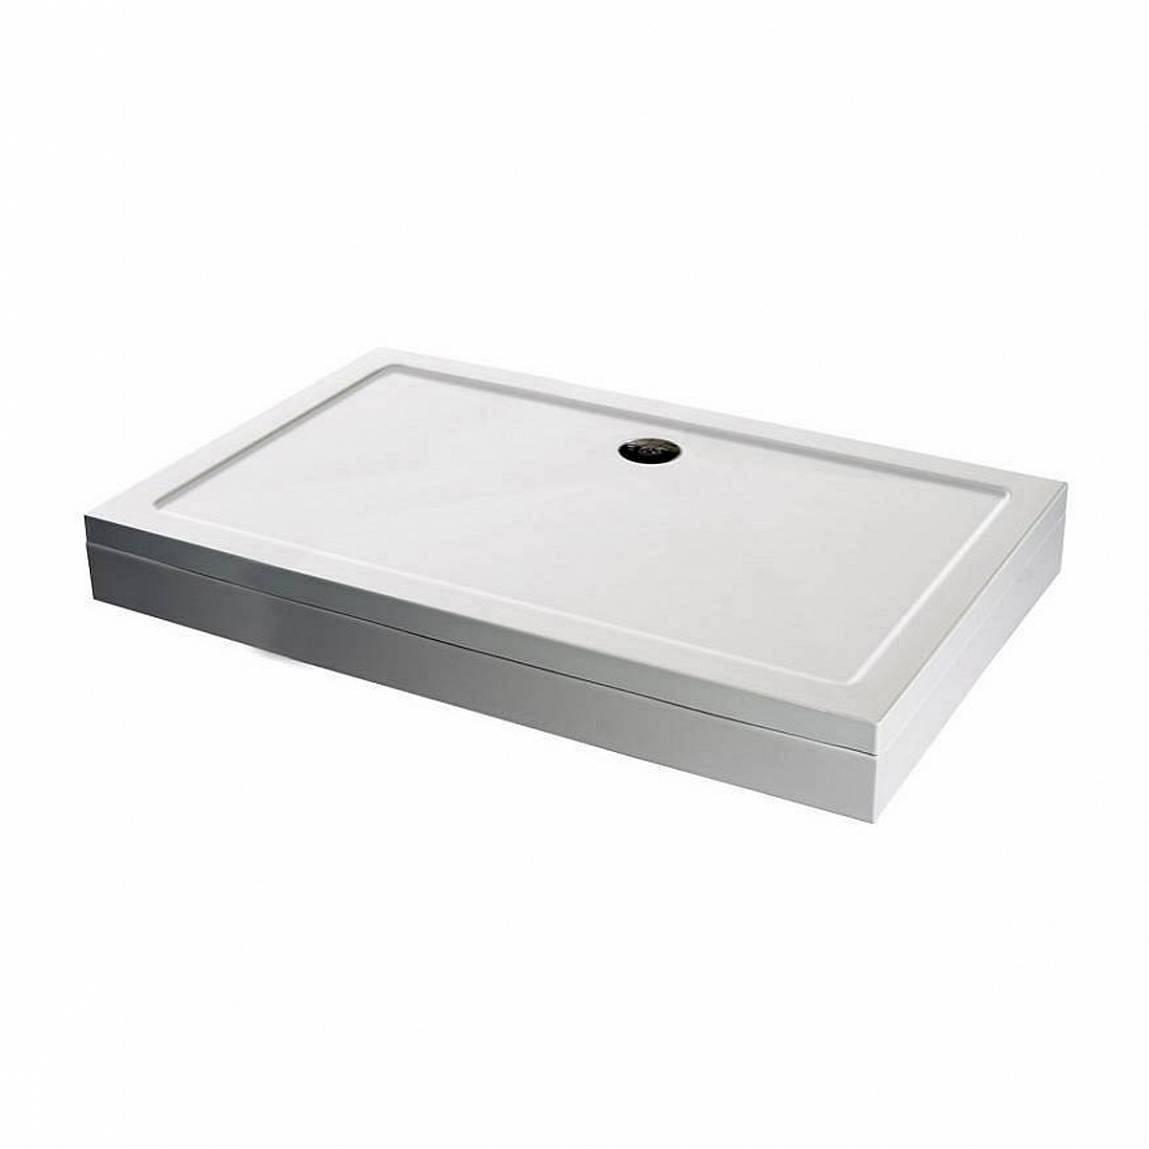 Image of Rectangular Stone Shower Tray & Riser Kit 1000 x 700